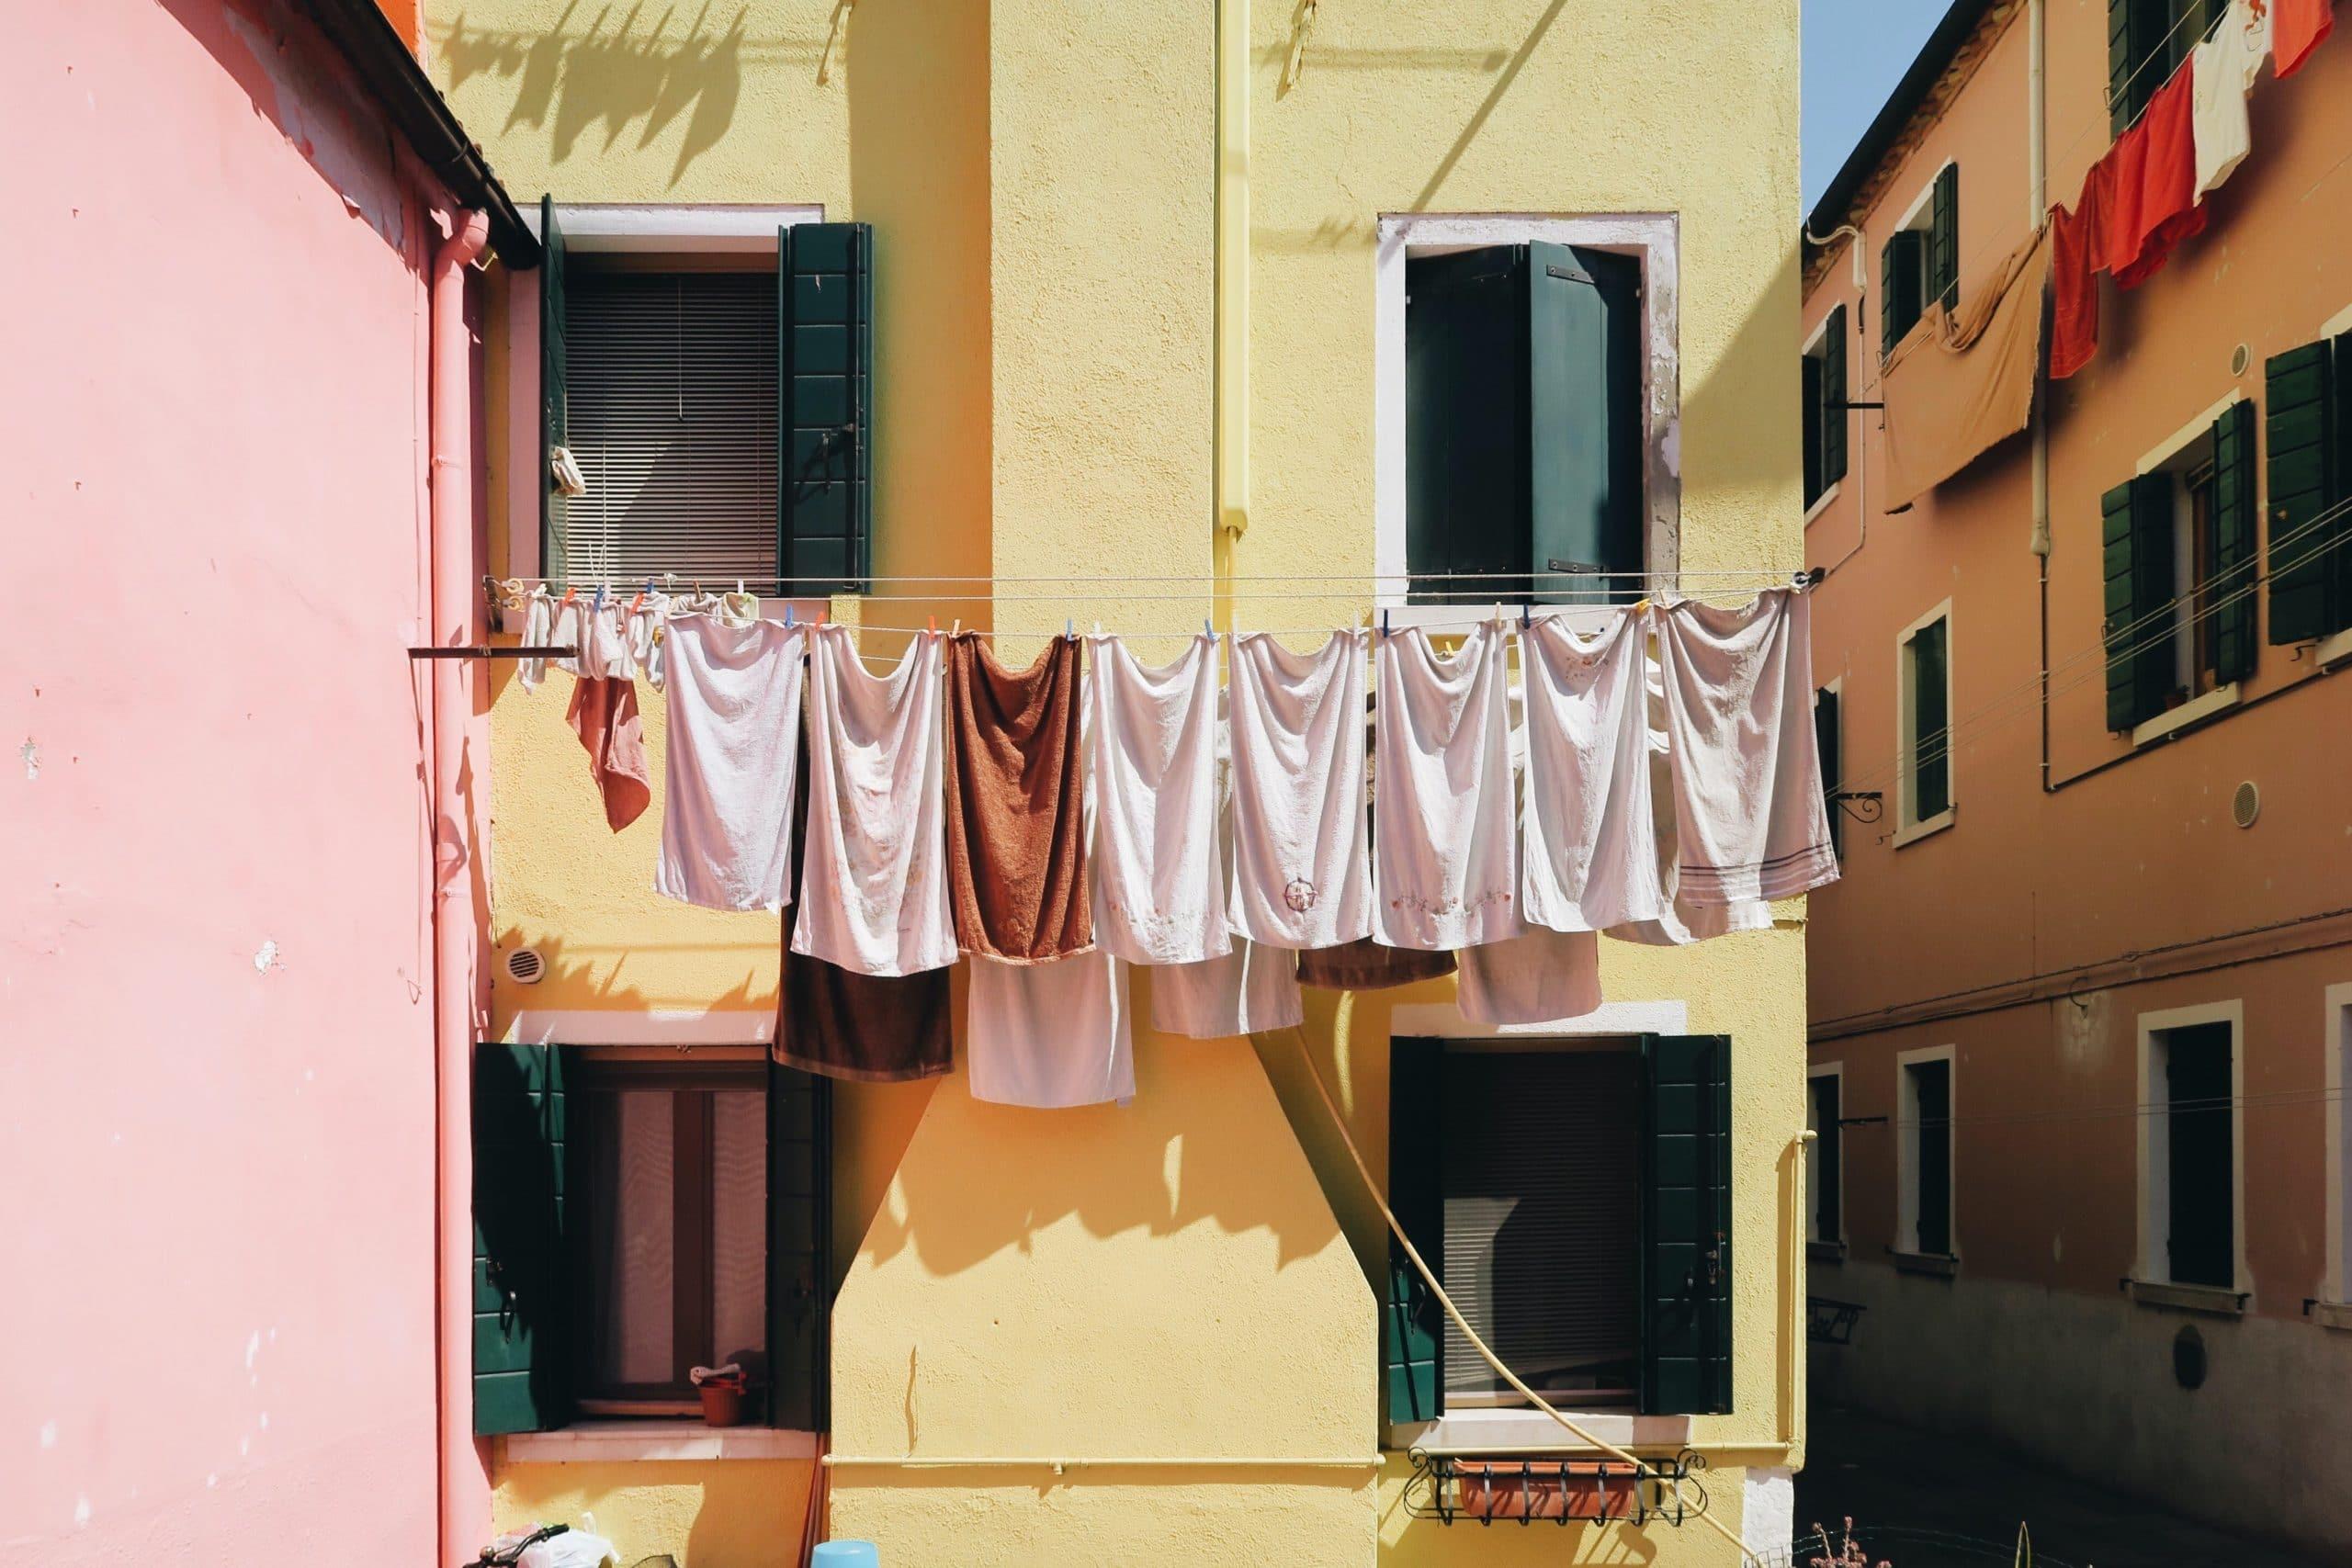 comforter laundry